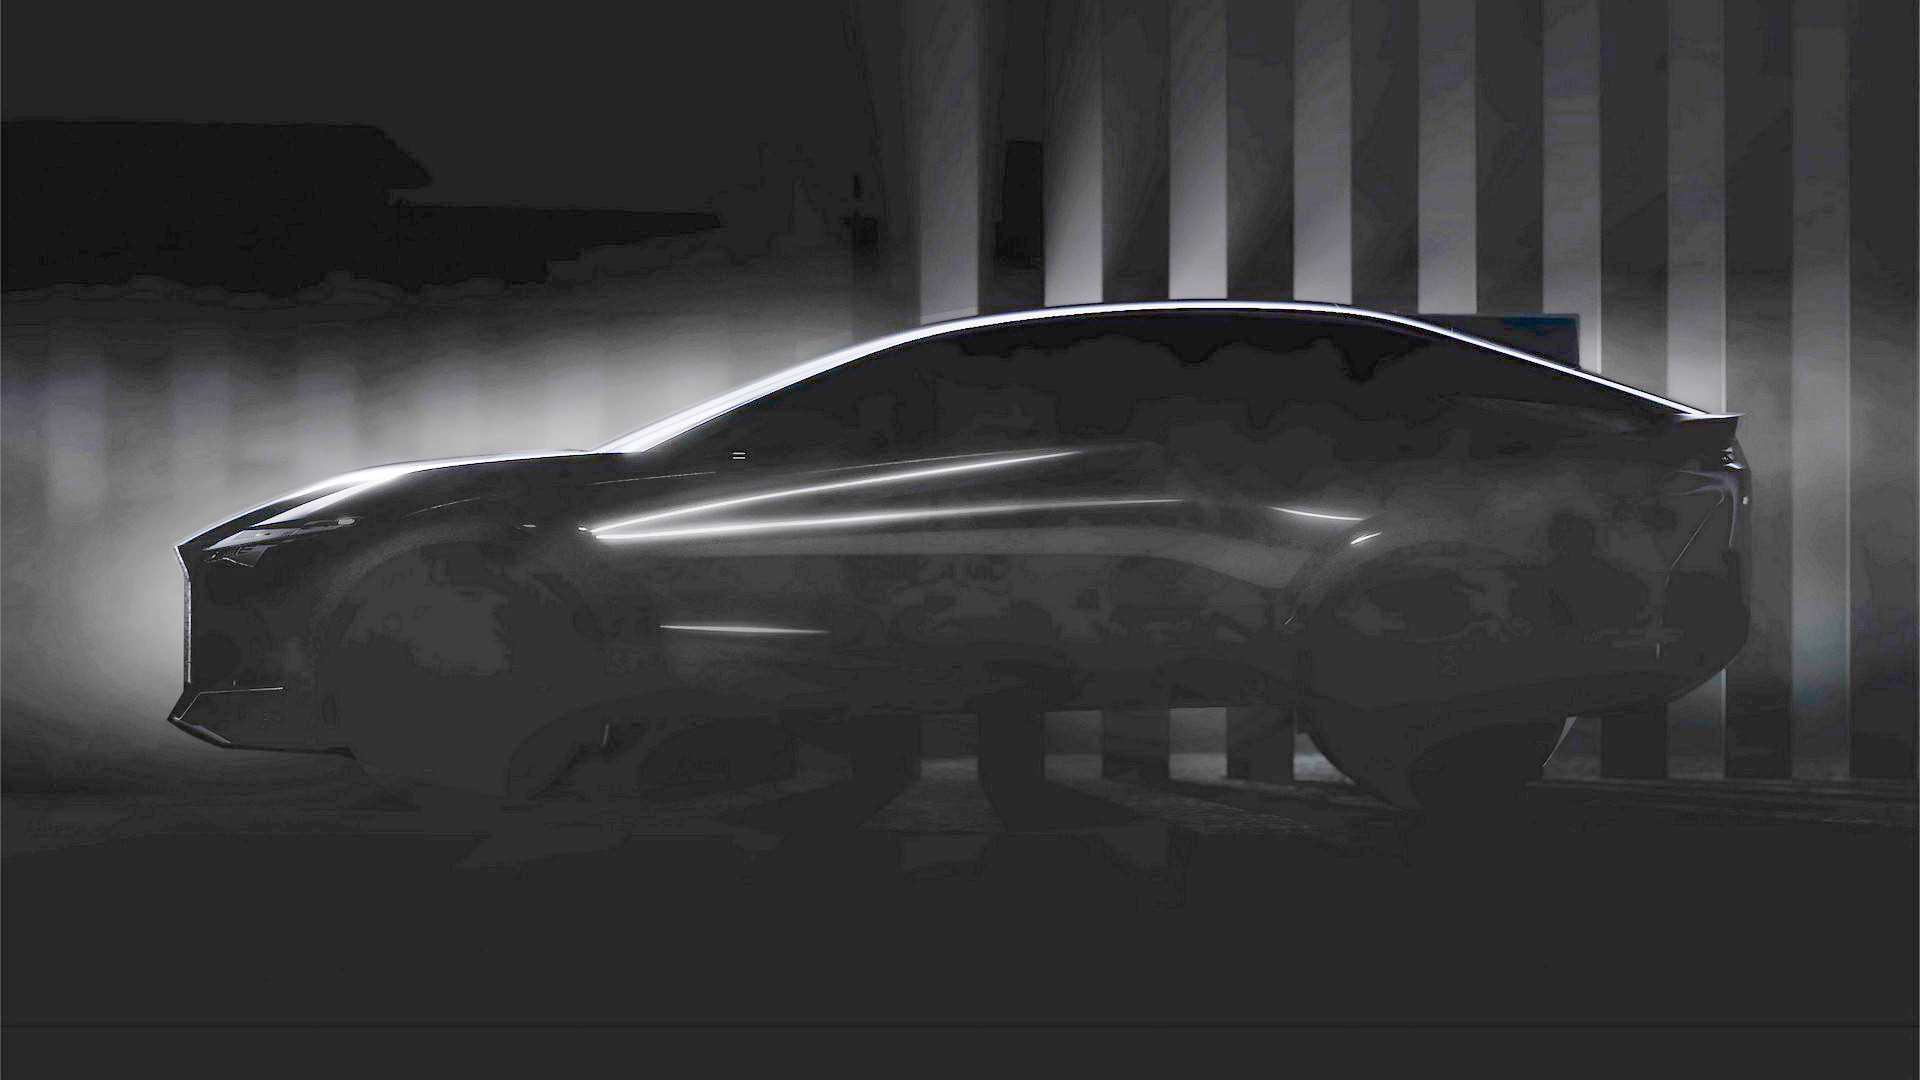 2021 Lexus concept car teaser (modified)